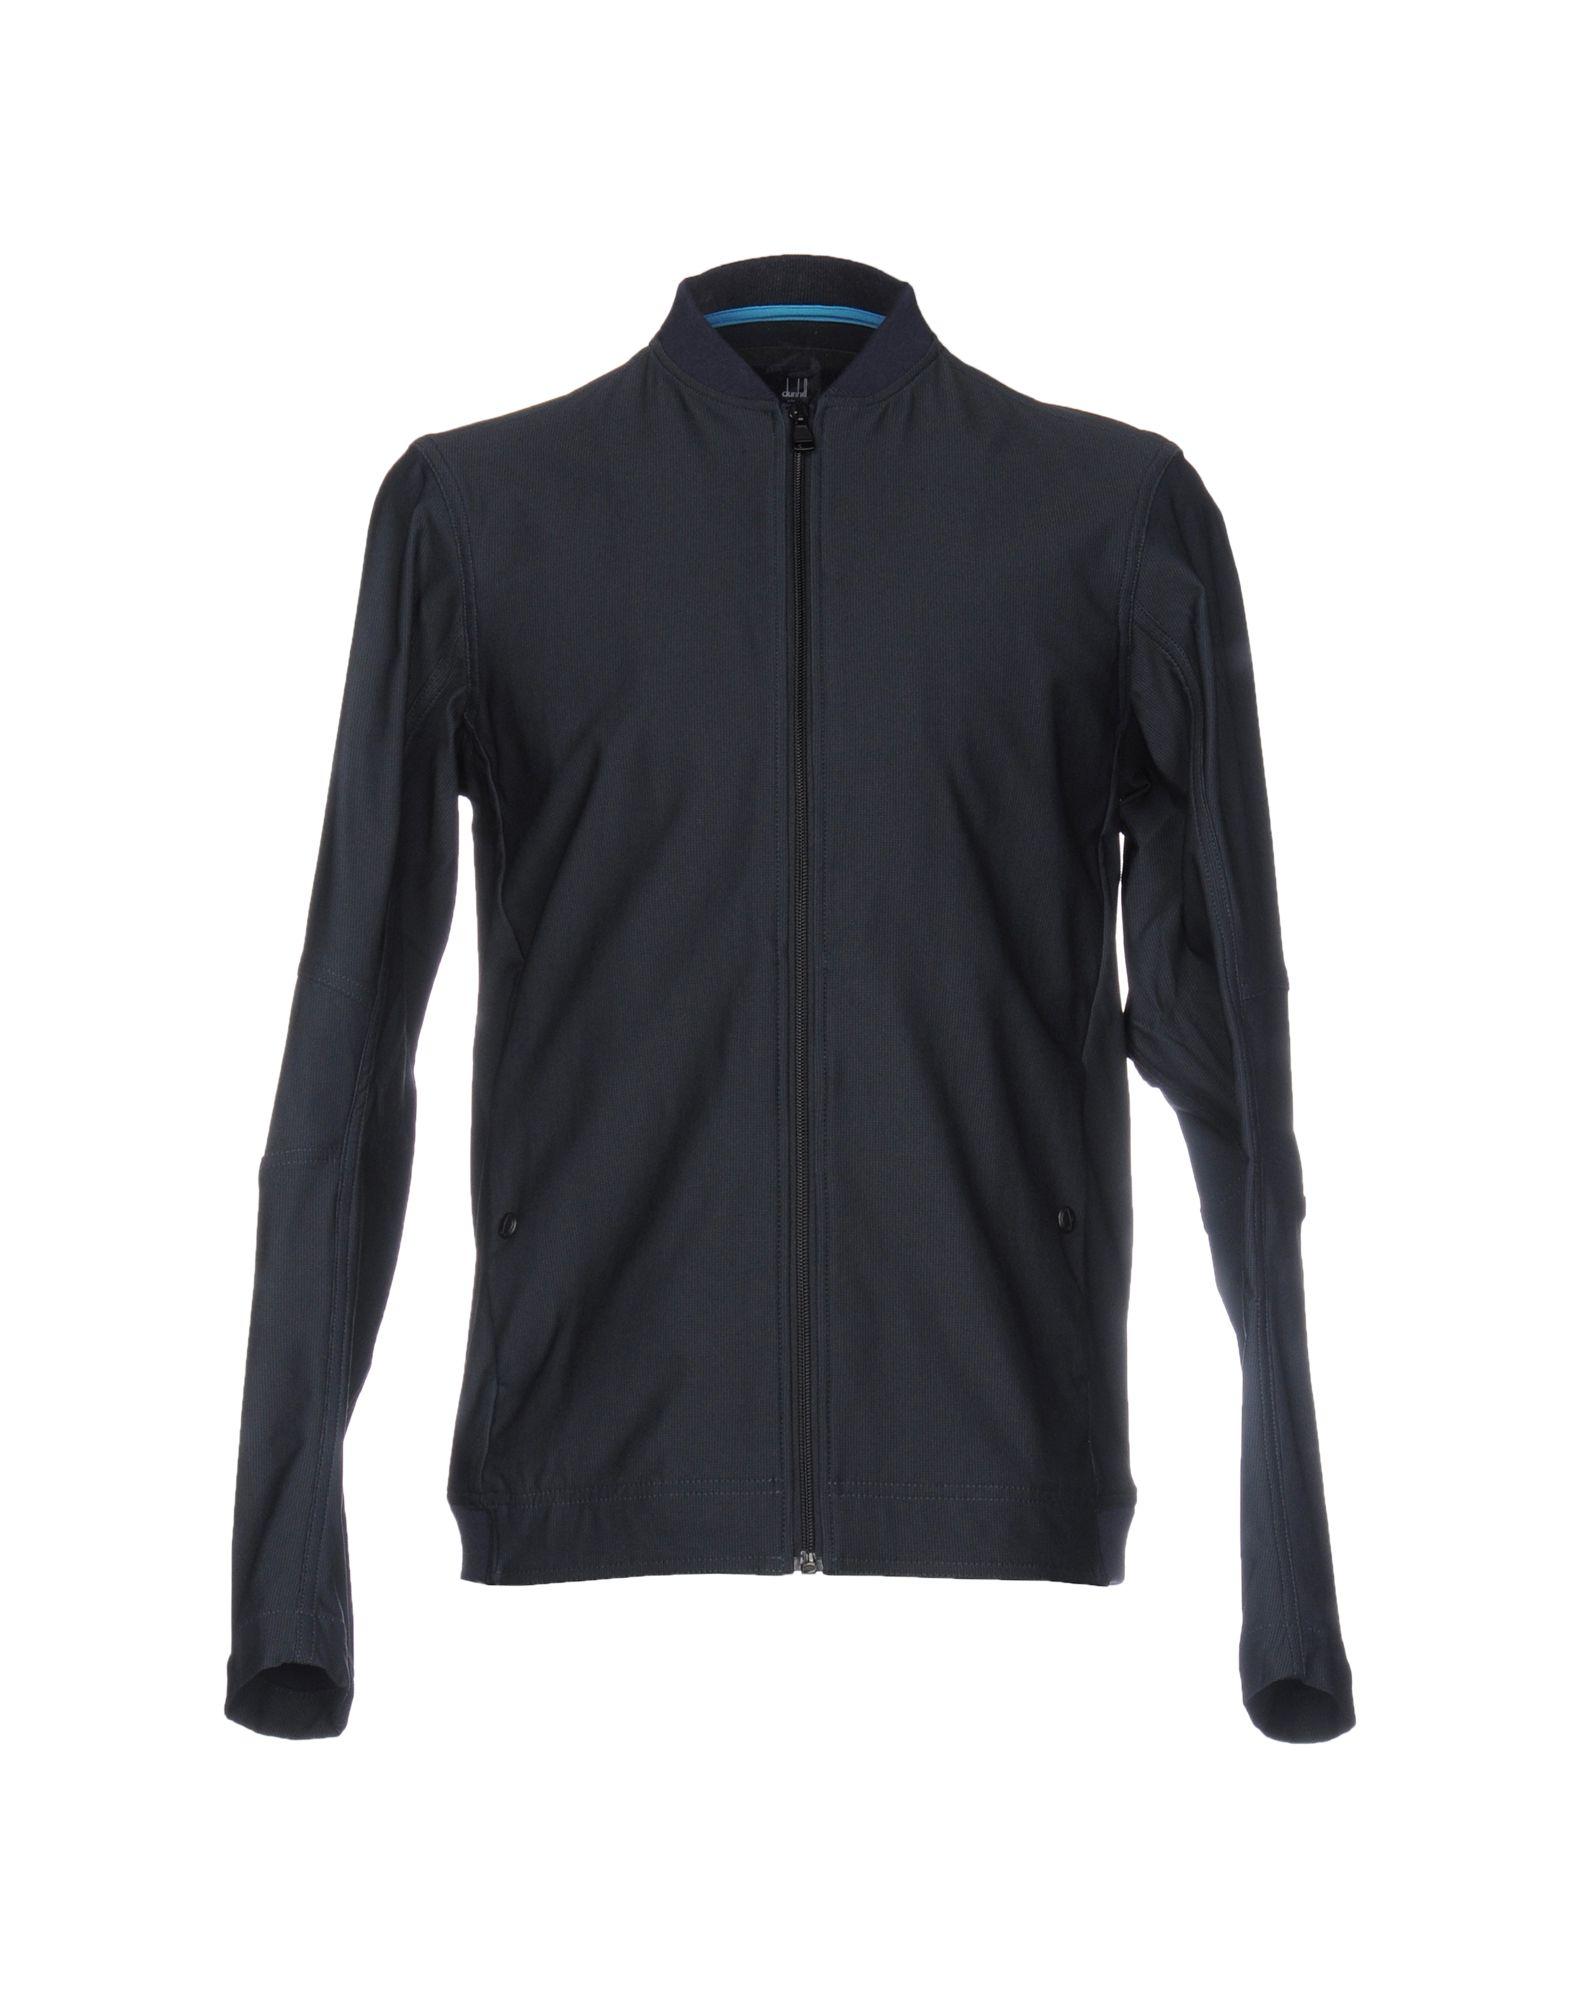 DUNHILL LINKS Куртка циферблатный индикатор links 0 1mm 0 001mm8